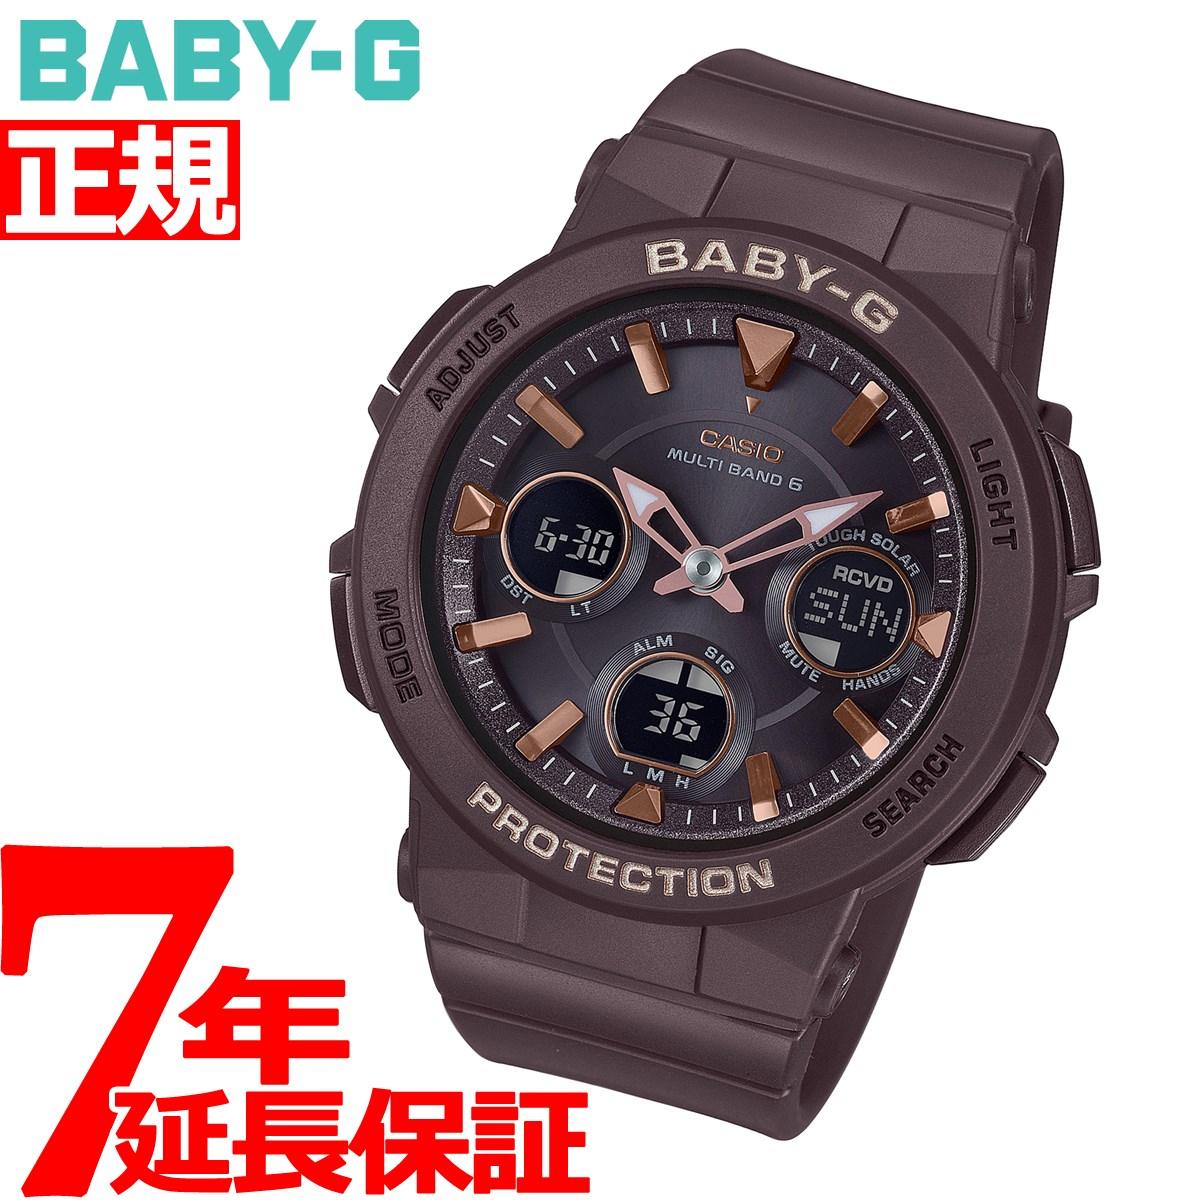 BABY-G カシオ ベビーG レディース 電波 ソーラー 腕時計 タフソーラー BGA-2510-5AJF